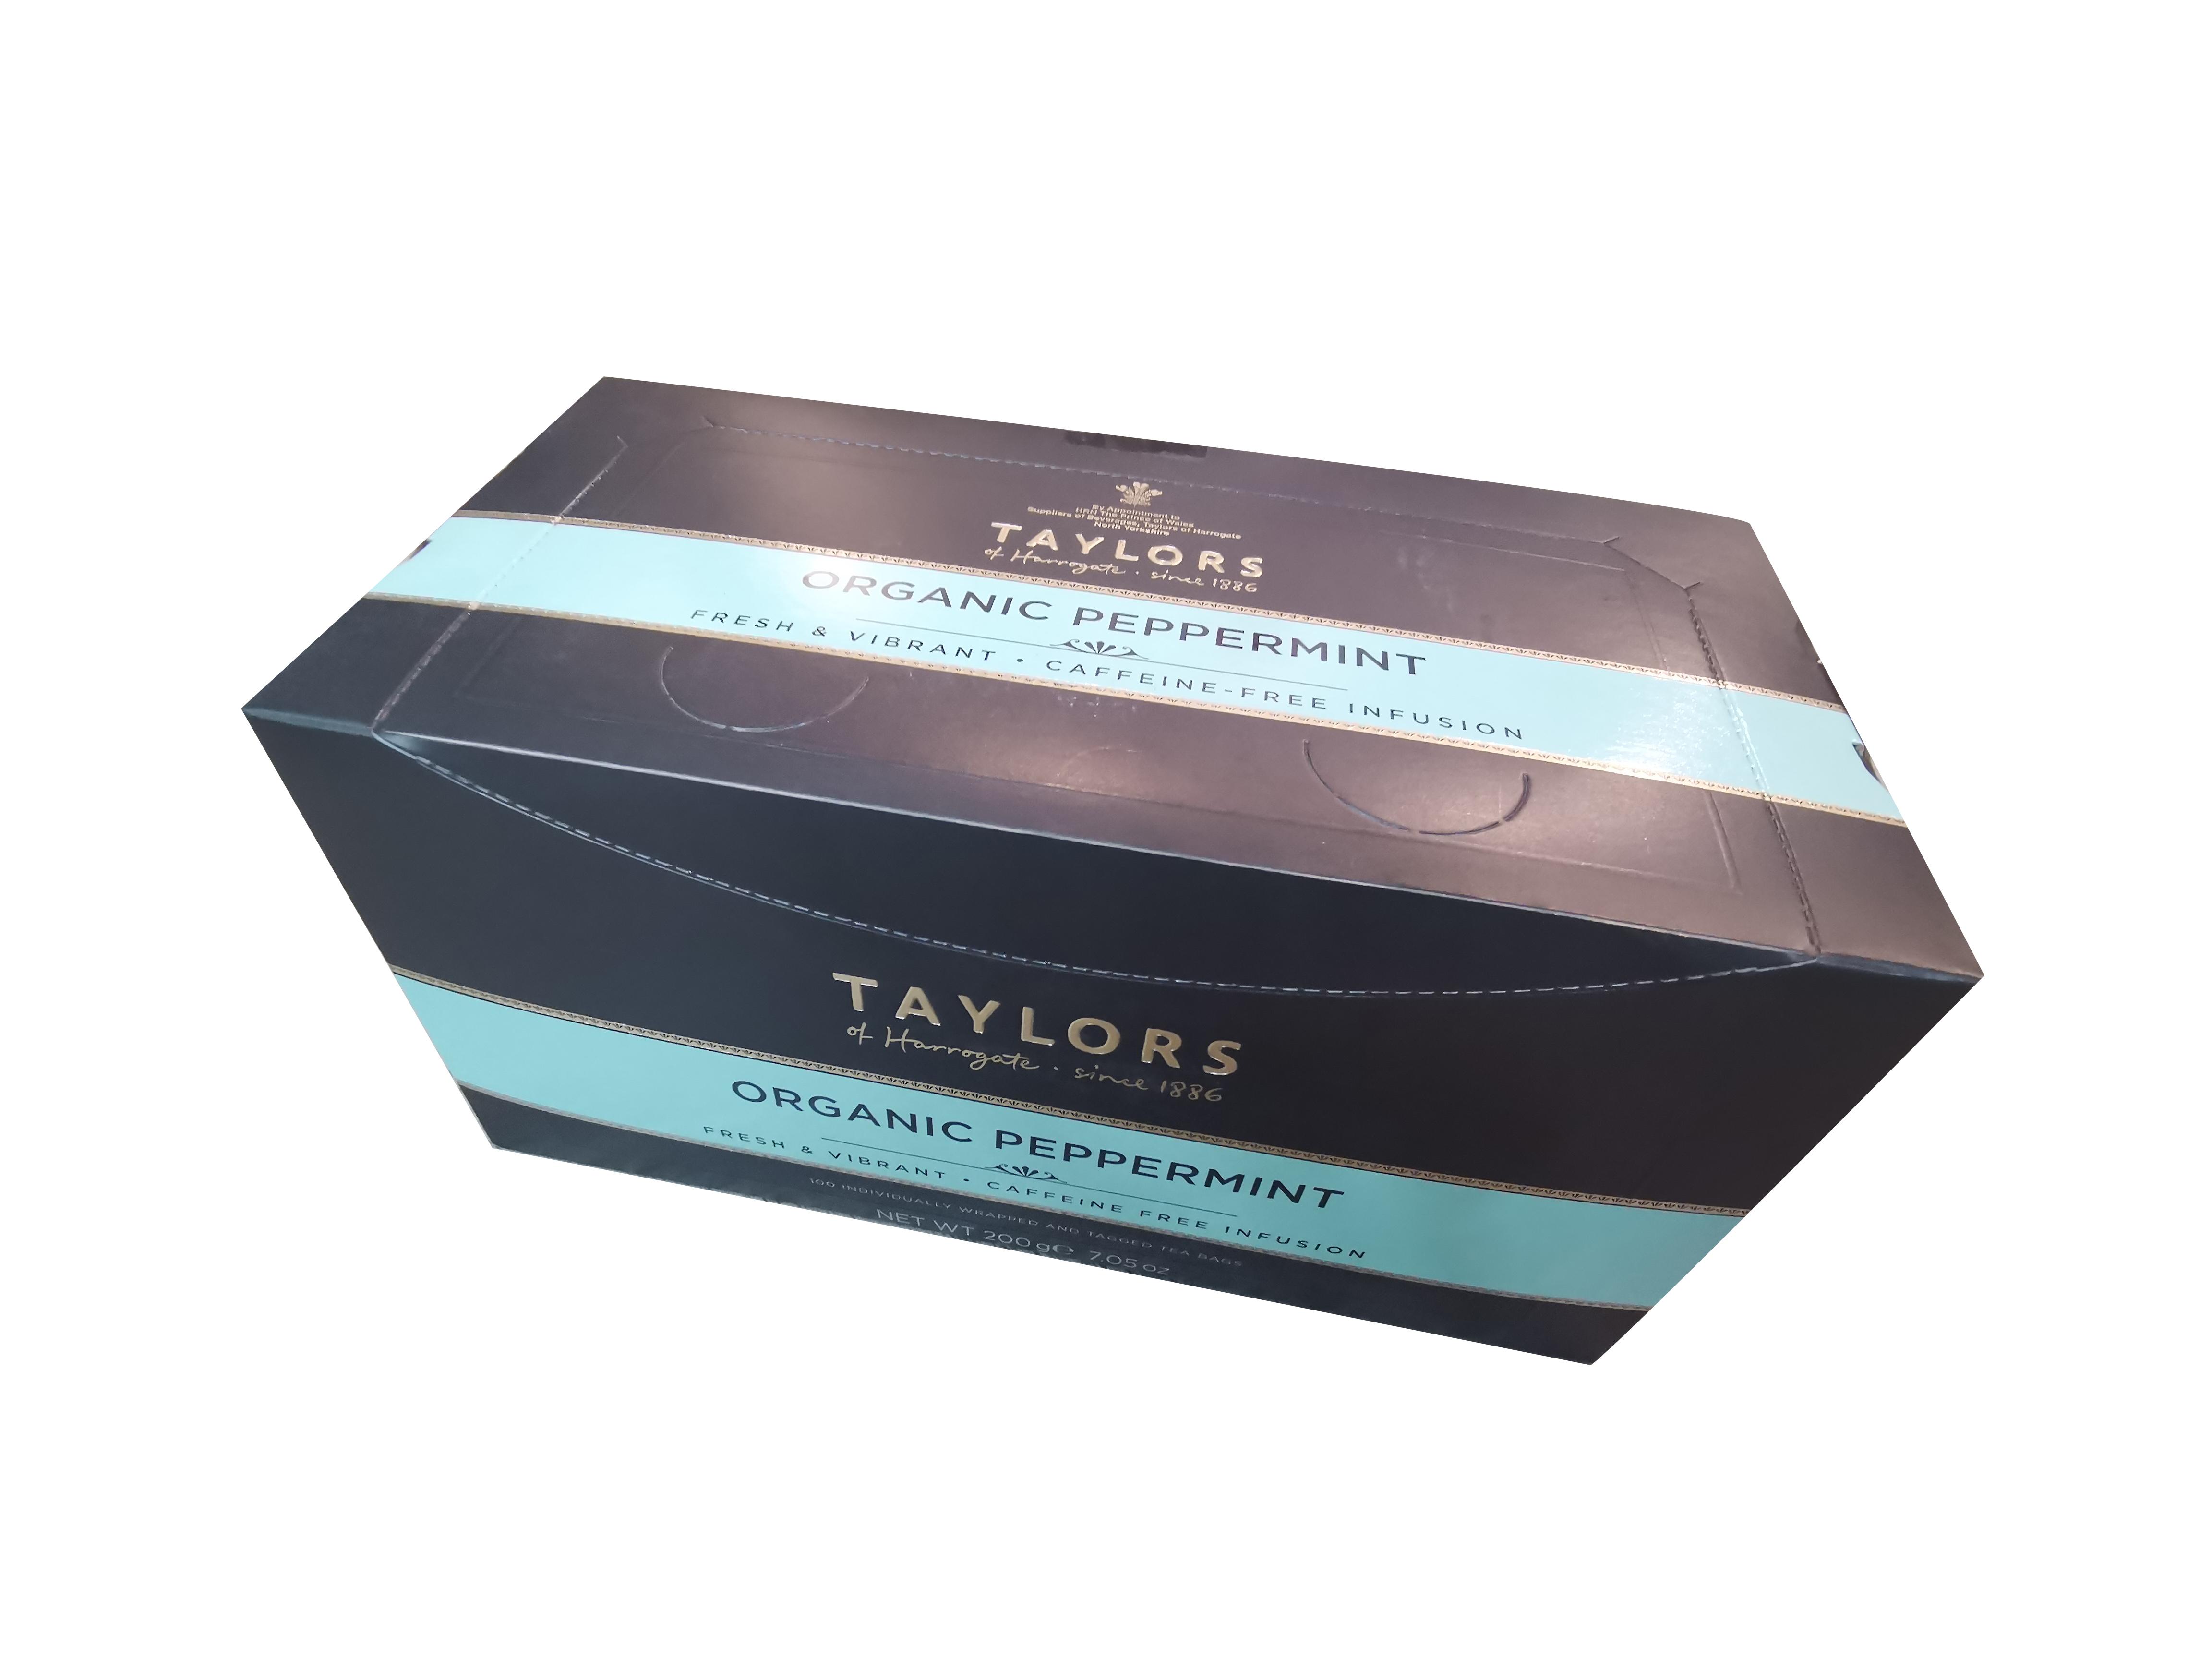 Taylors 薄荷茶